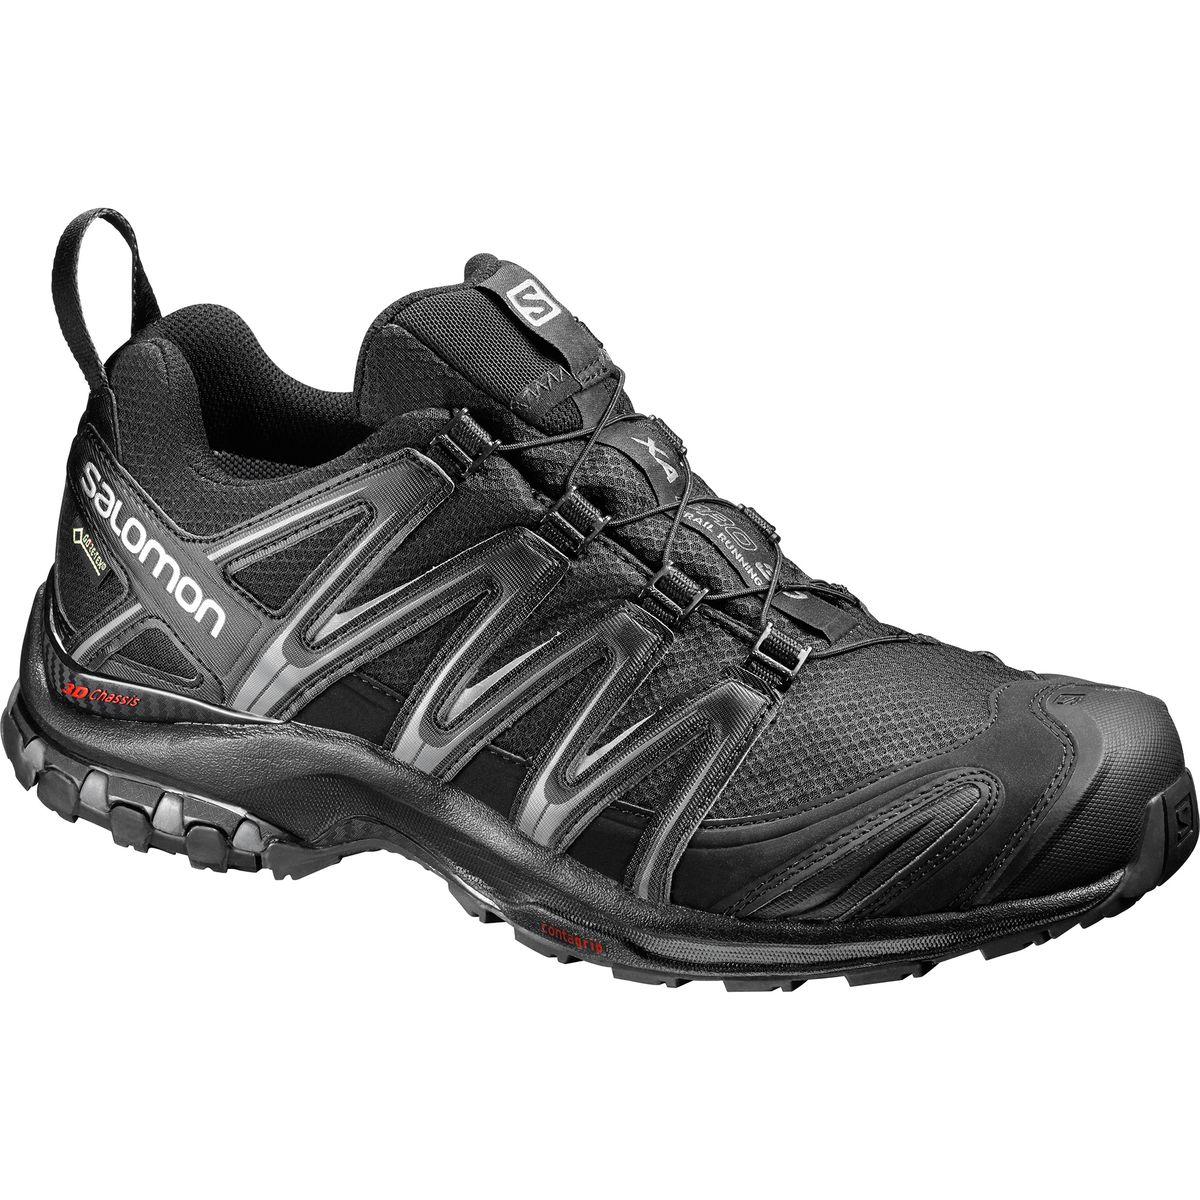 Salomon XA Pro 3D GTX Trail Running Shoe Men's